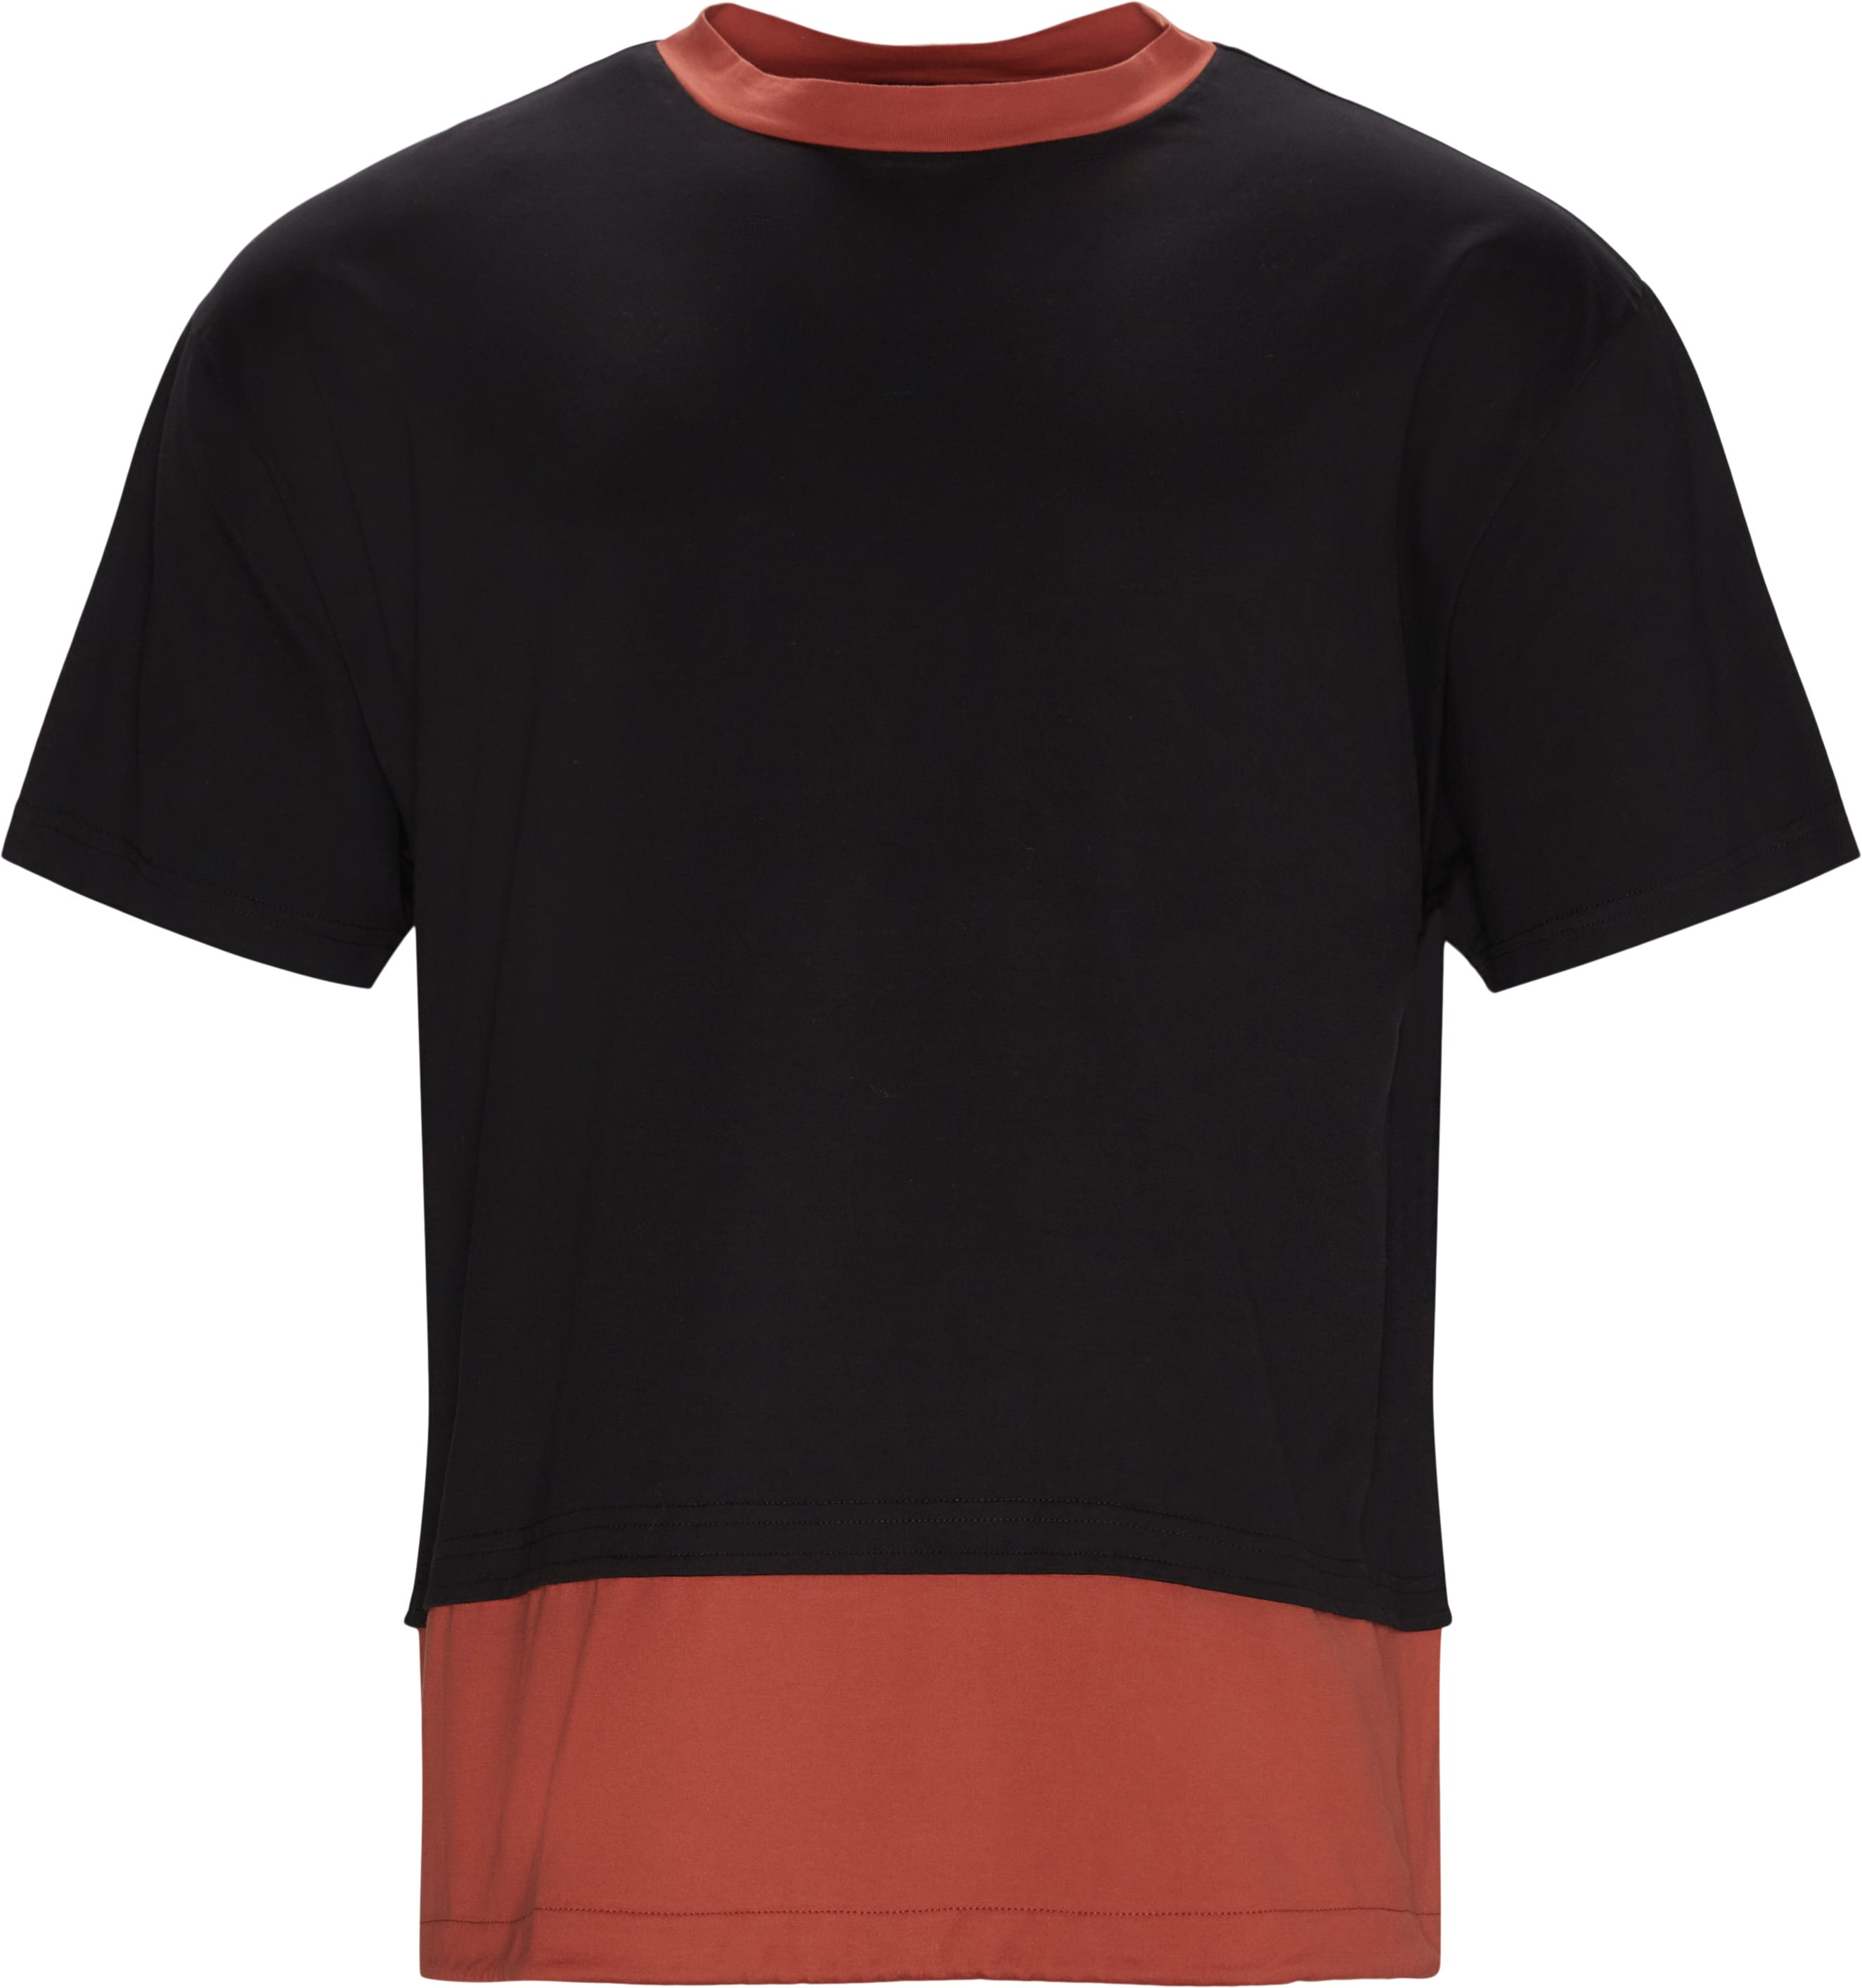 T-shirts - Loose fit - Sort